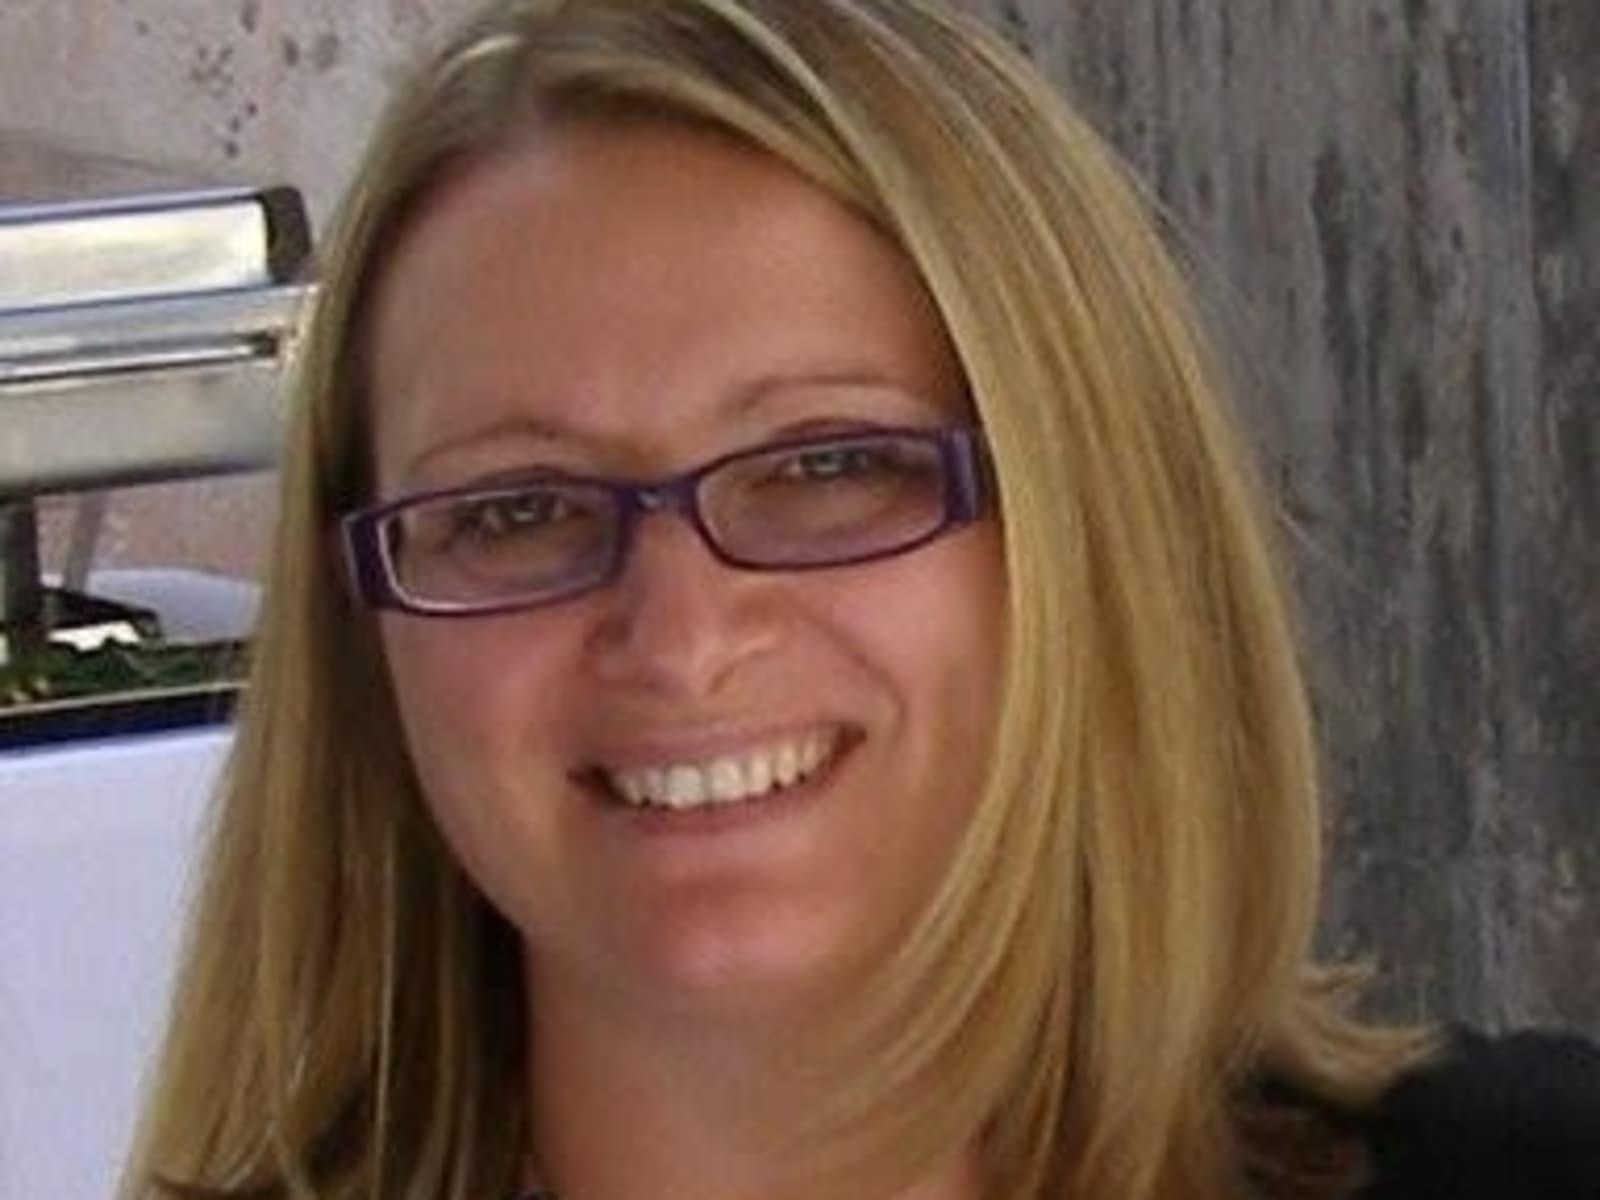 Naomi from Canberra, Australian Capital Territory, Australia